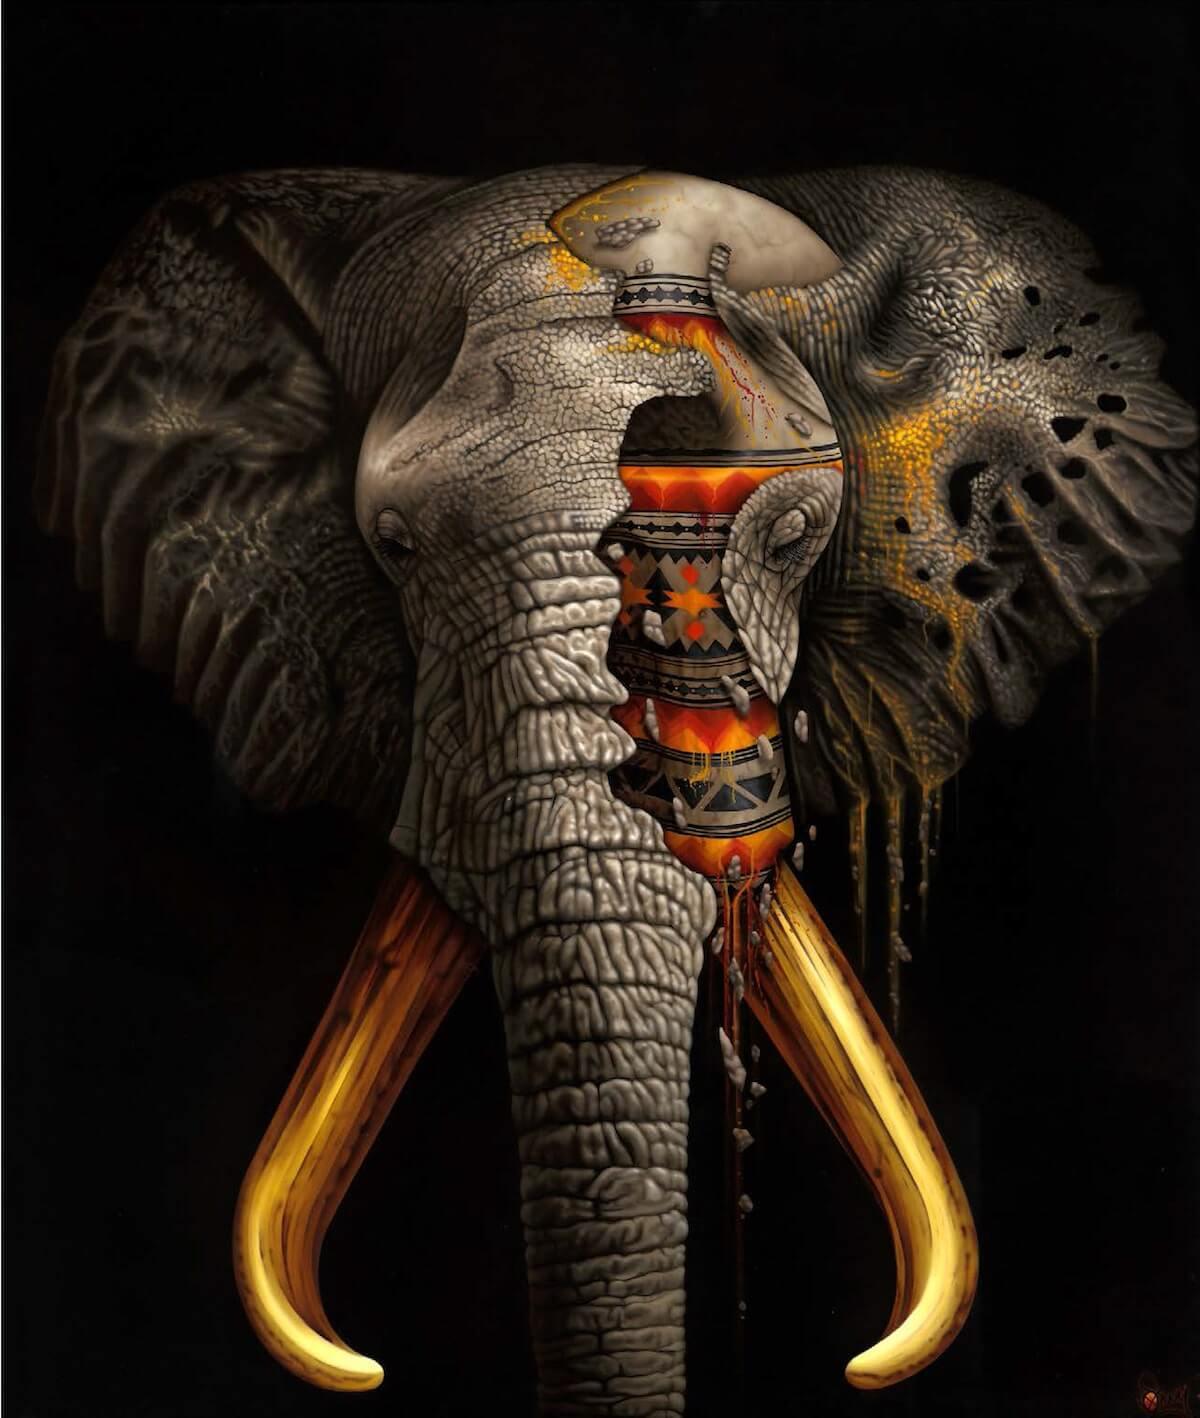 sonny animal paintings street animals artist endangered elephant species history awareness speaks mudiwa advertisement lives